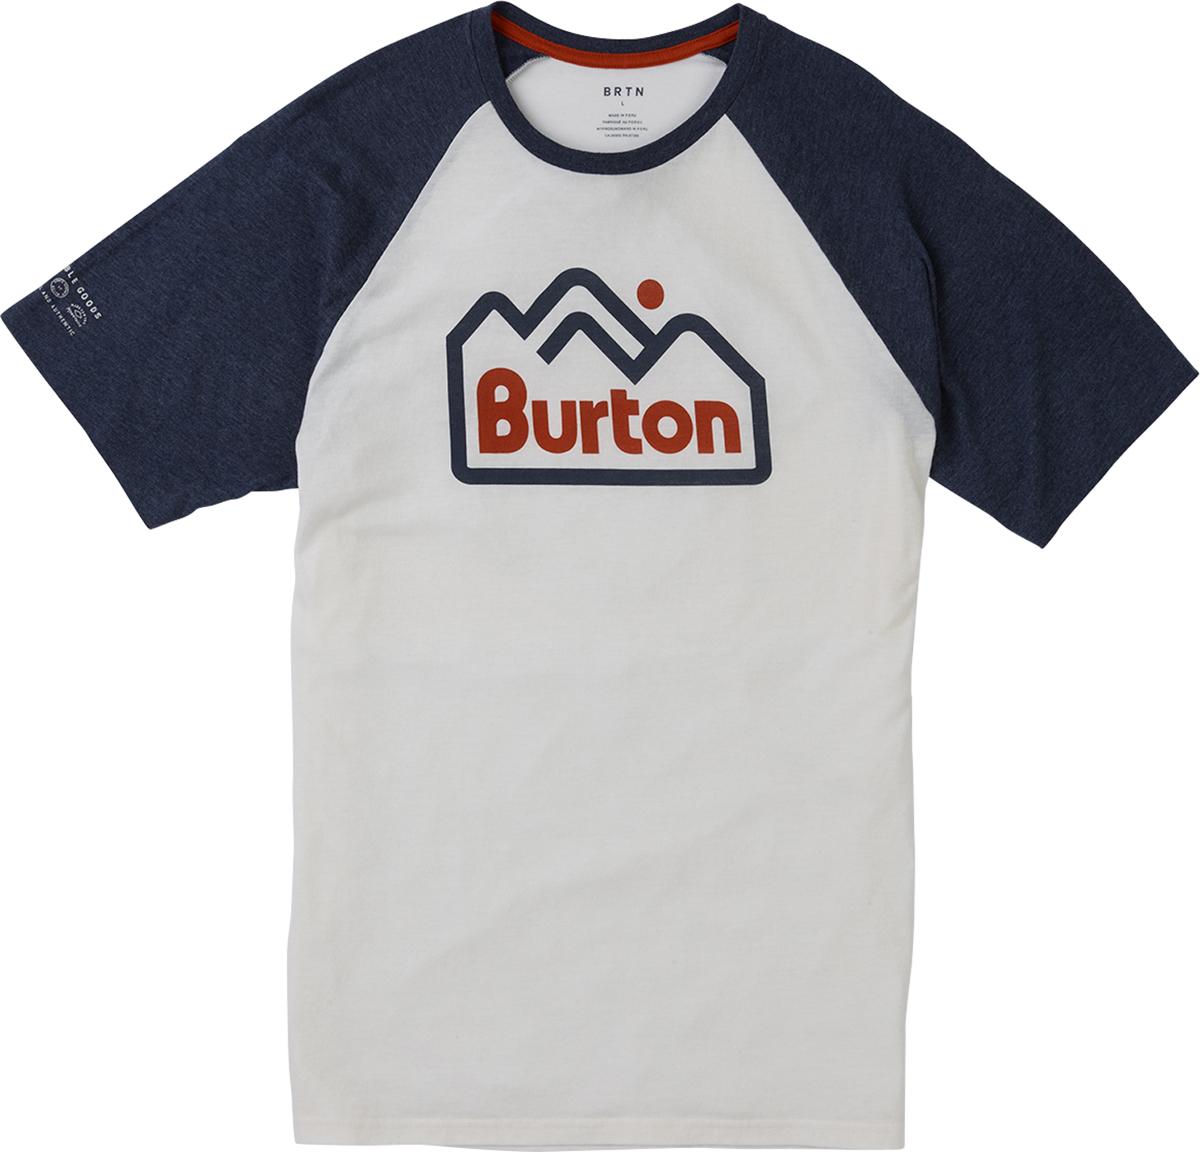 Футболка мужская Burton Mb Mtnjack Active, цвет: белый. 17877102100. Размер XL (52)